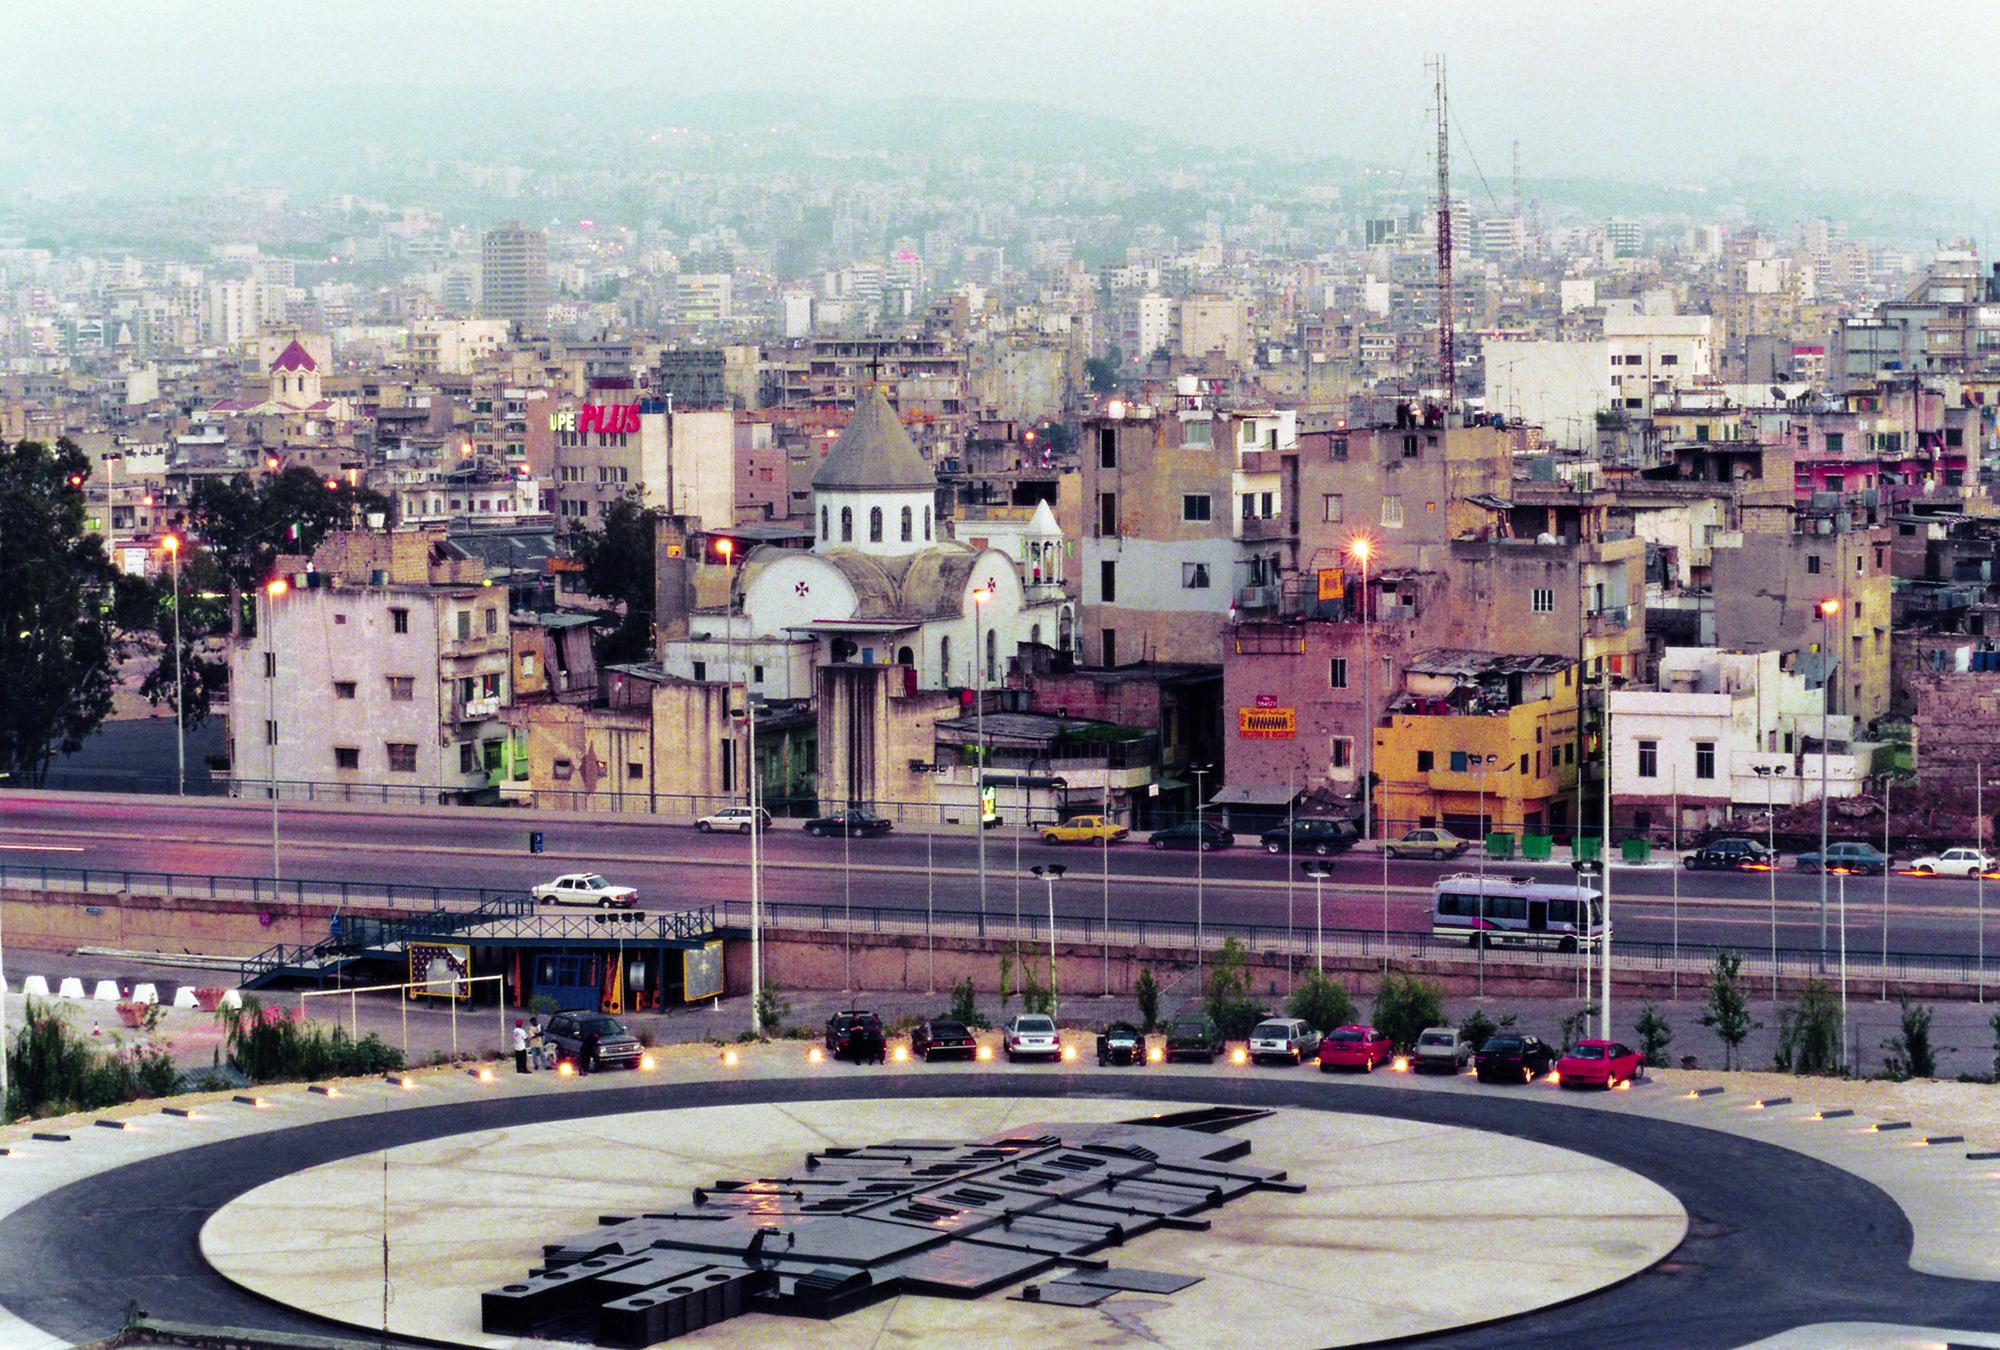 Flashback: B 018 / Bernard Khoury Architects, © Bernard Khoury Architects